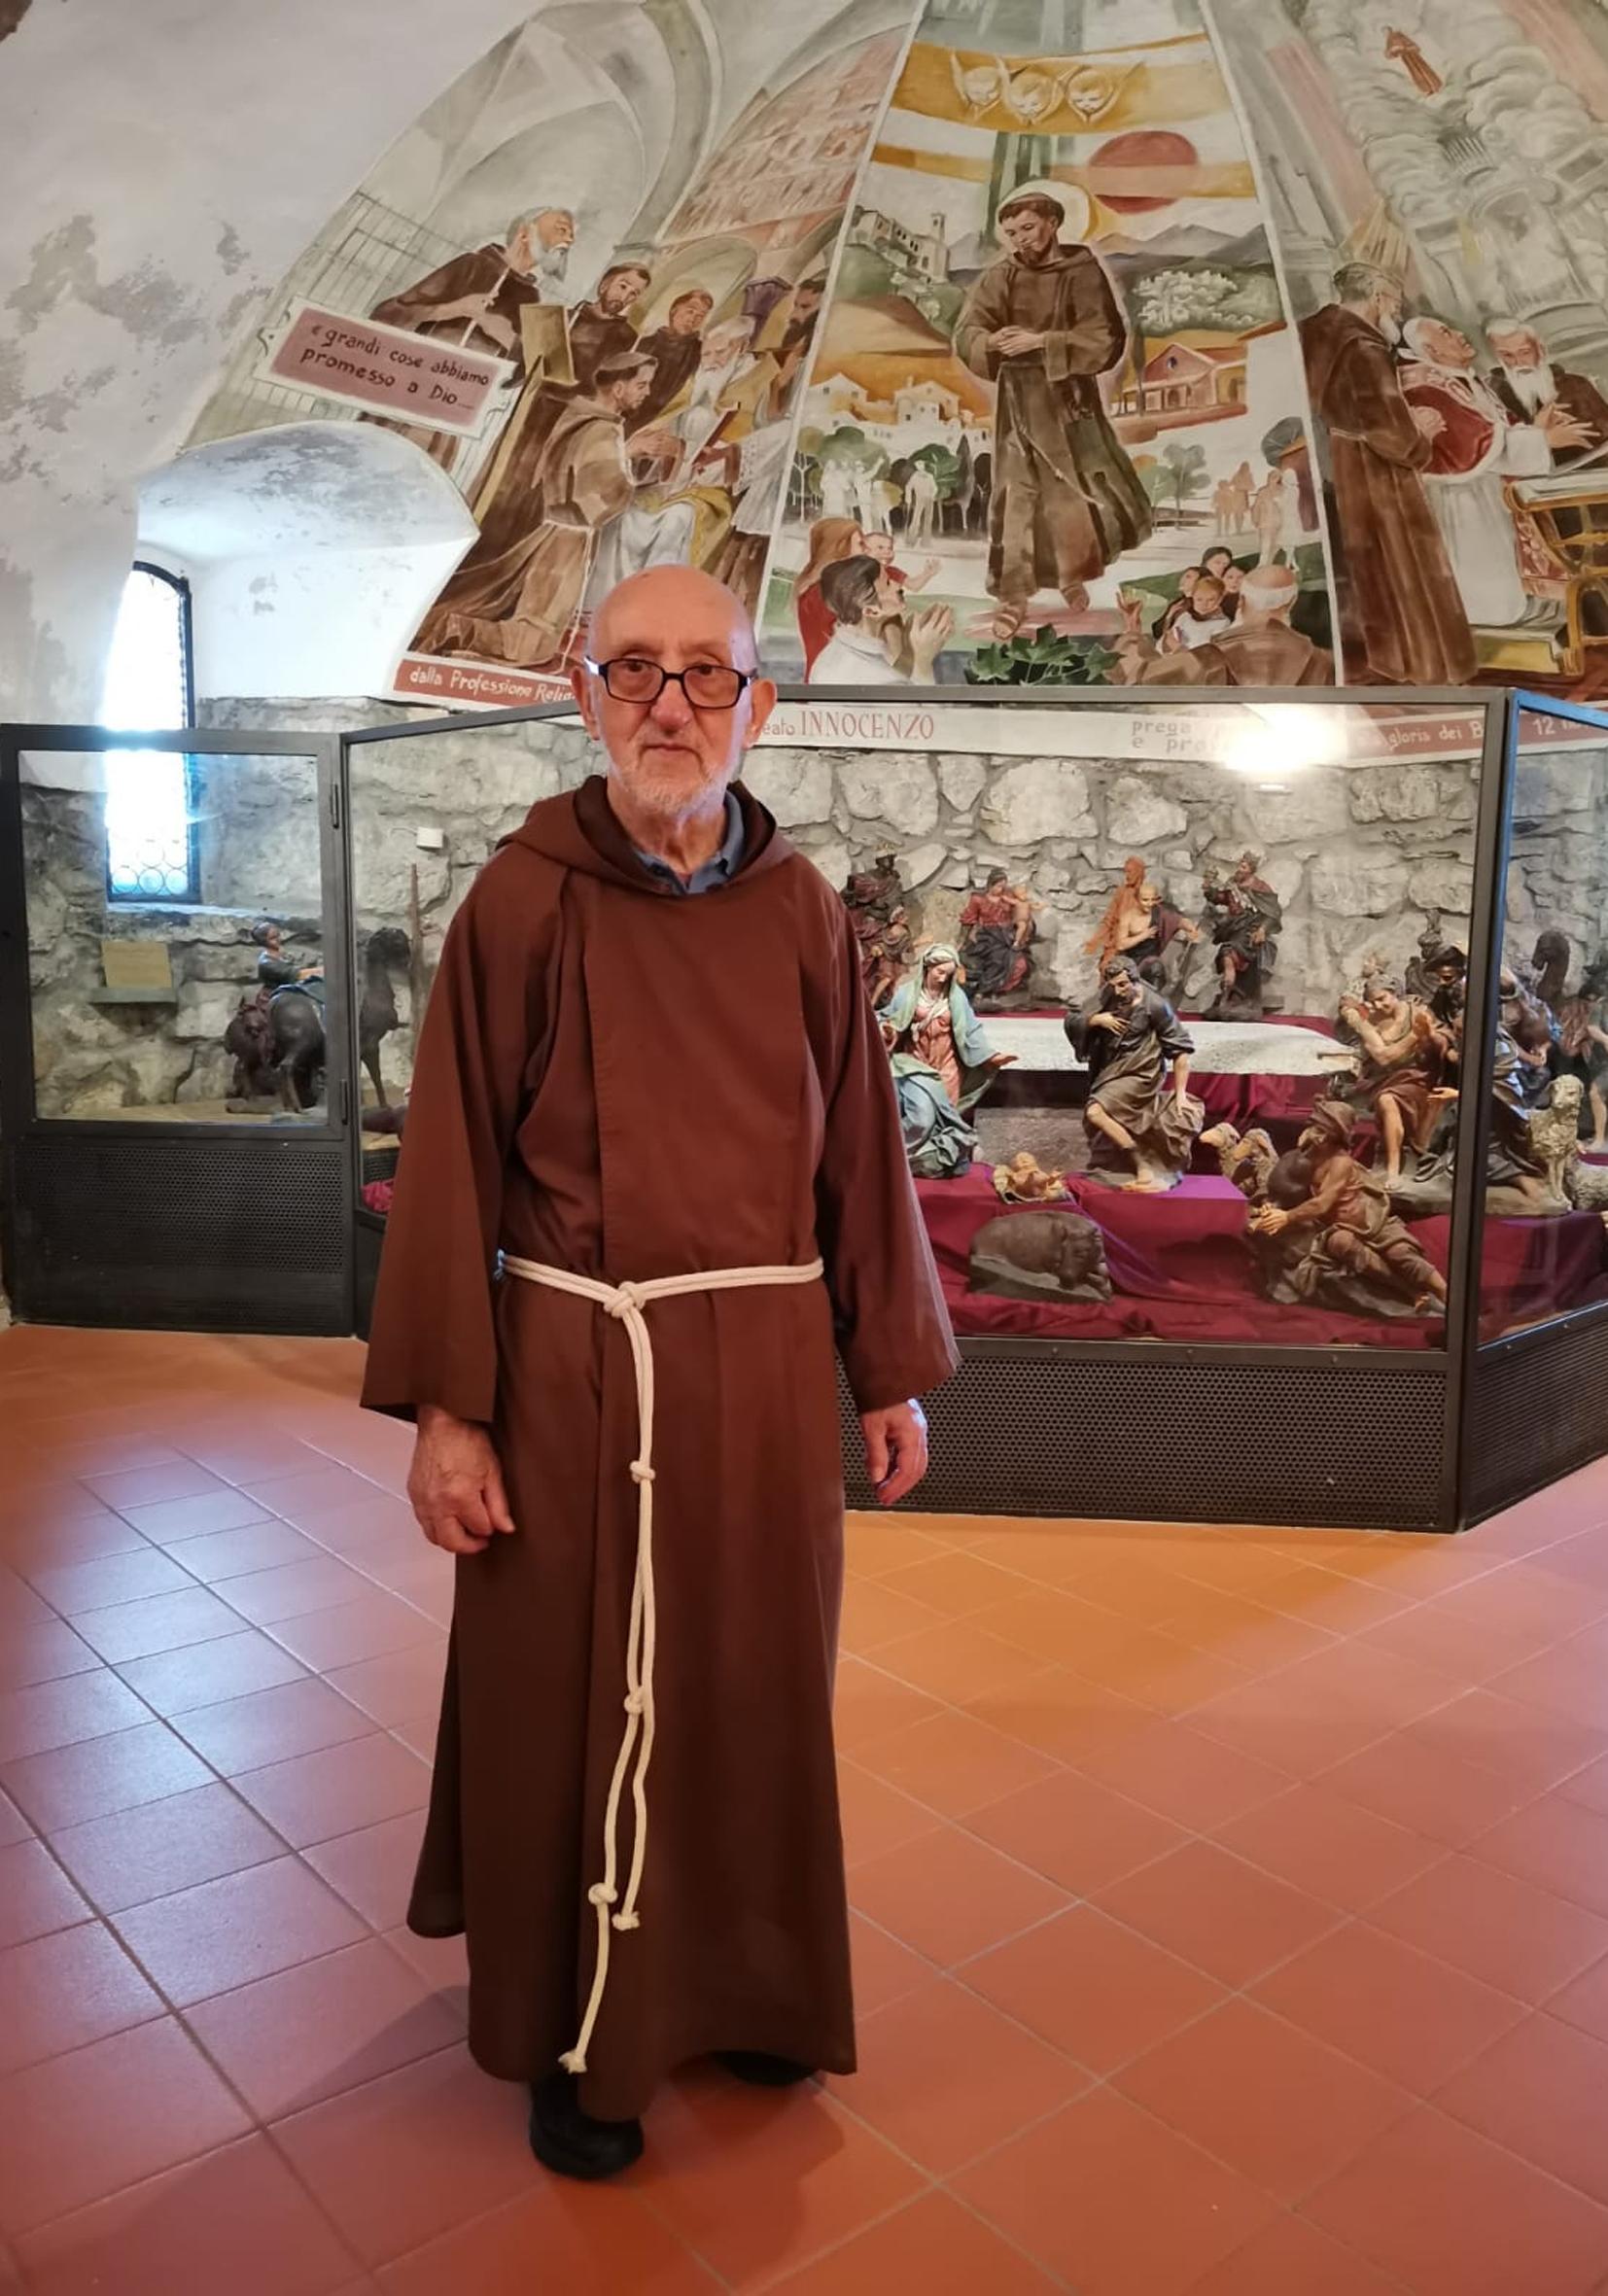 Agenzia funebre Gatti - Necrologi - Fra Aligi Quadri